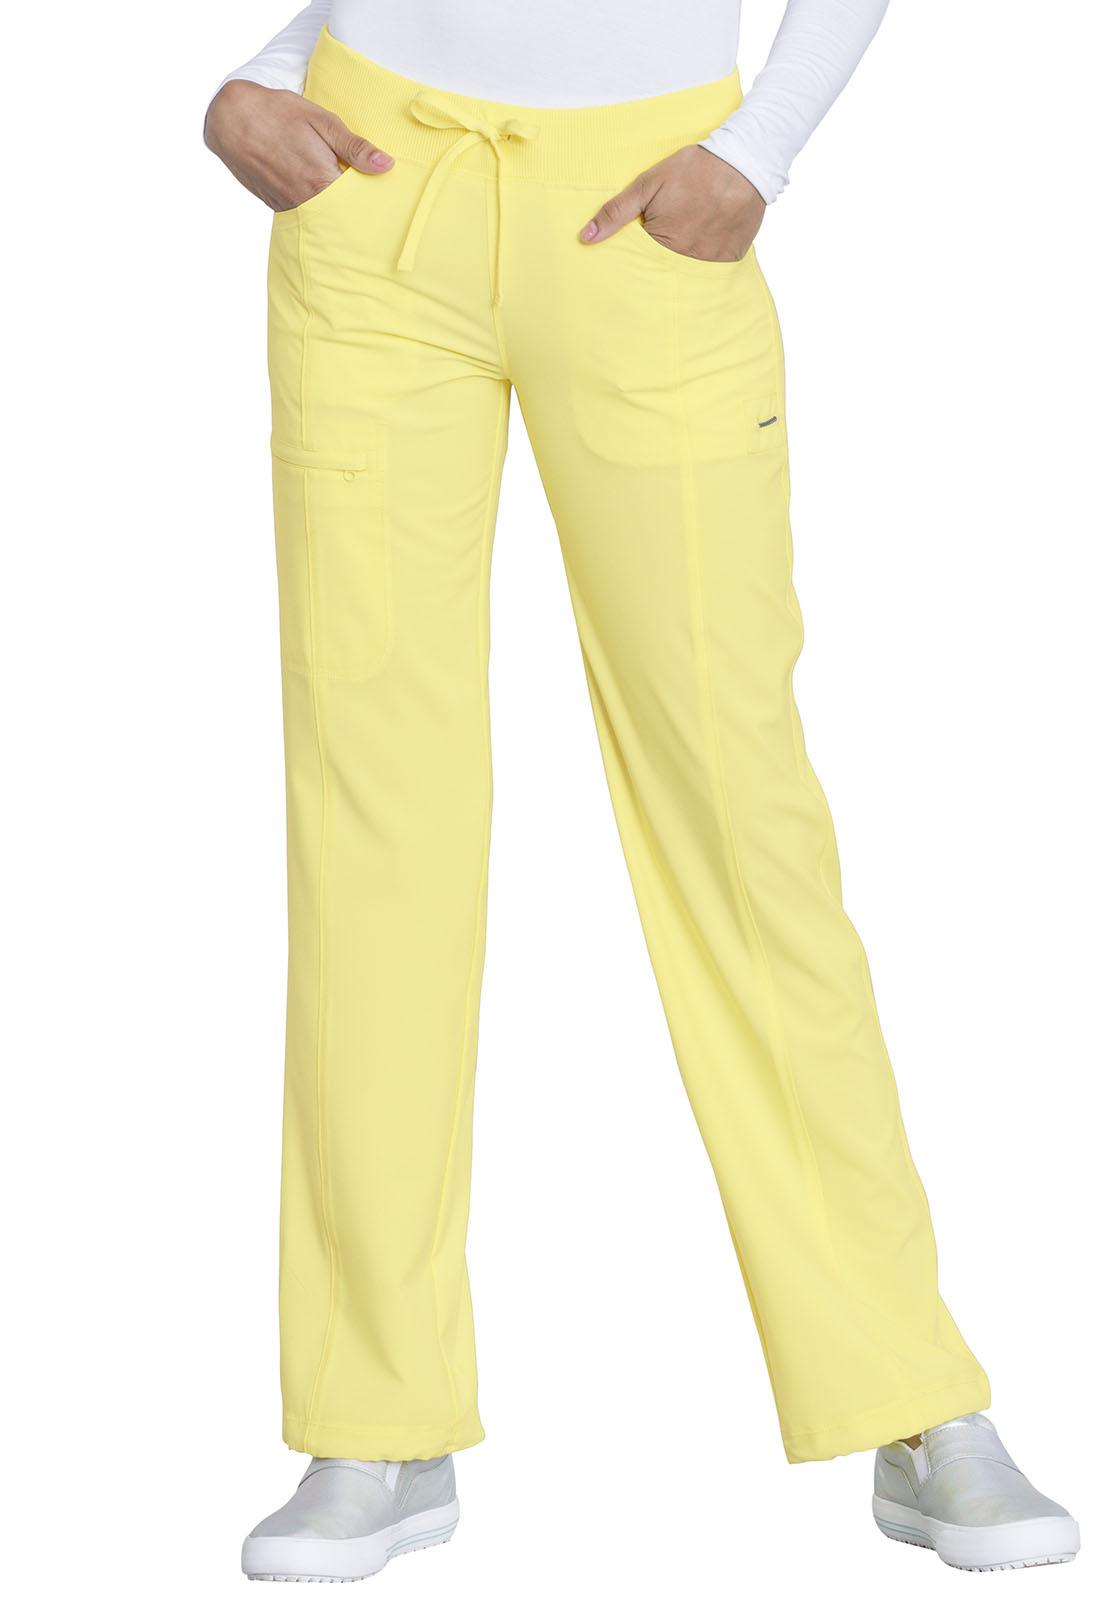 f61d30f7e2a Infinity Low Rise Straight Leg Drawstring Pant in Lovely Lemon 1123A ...